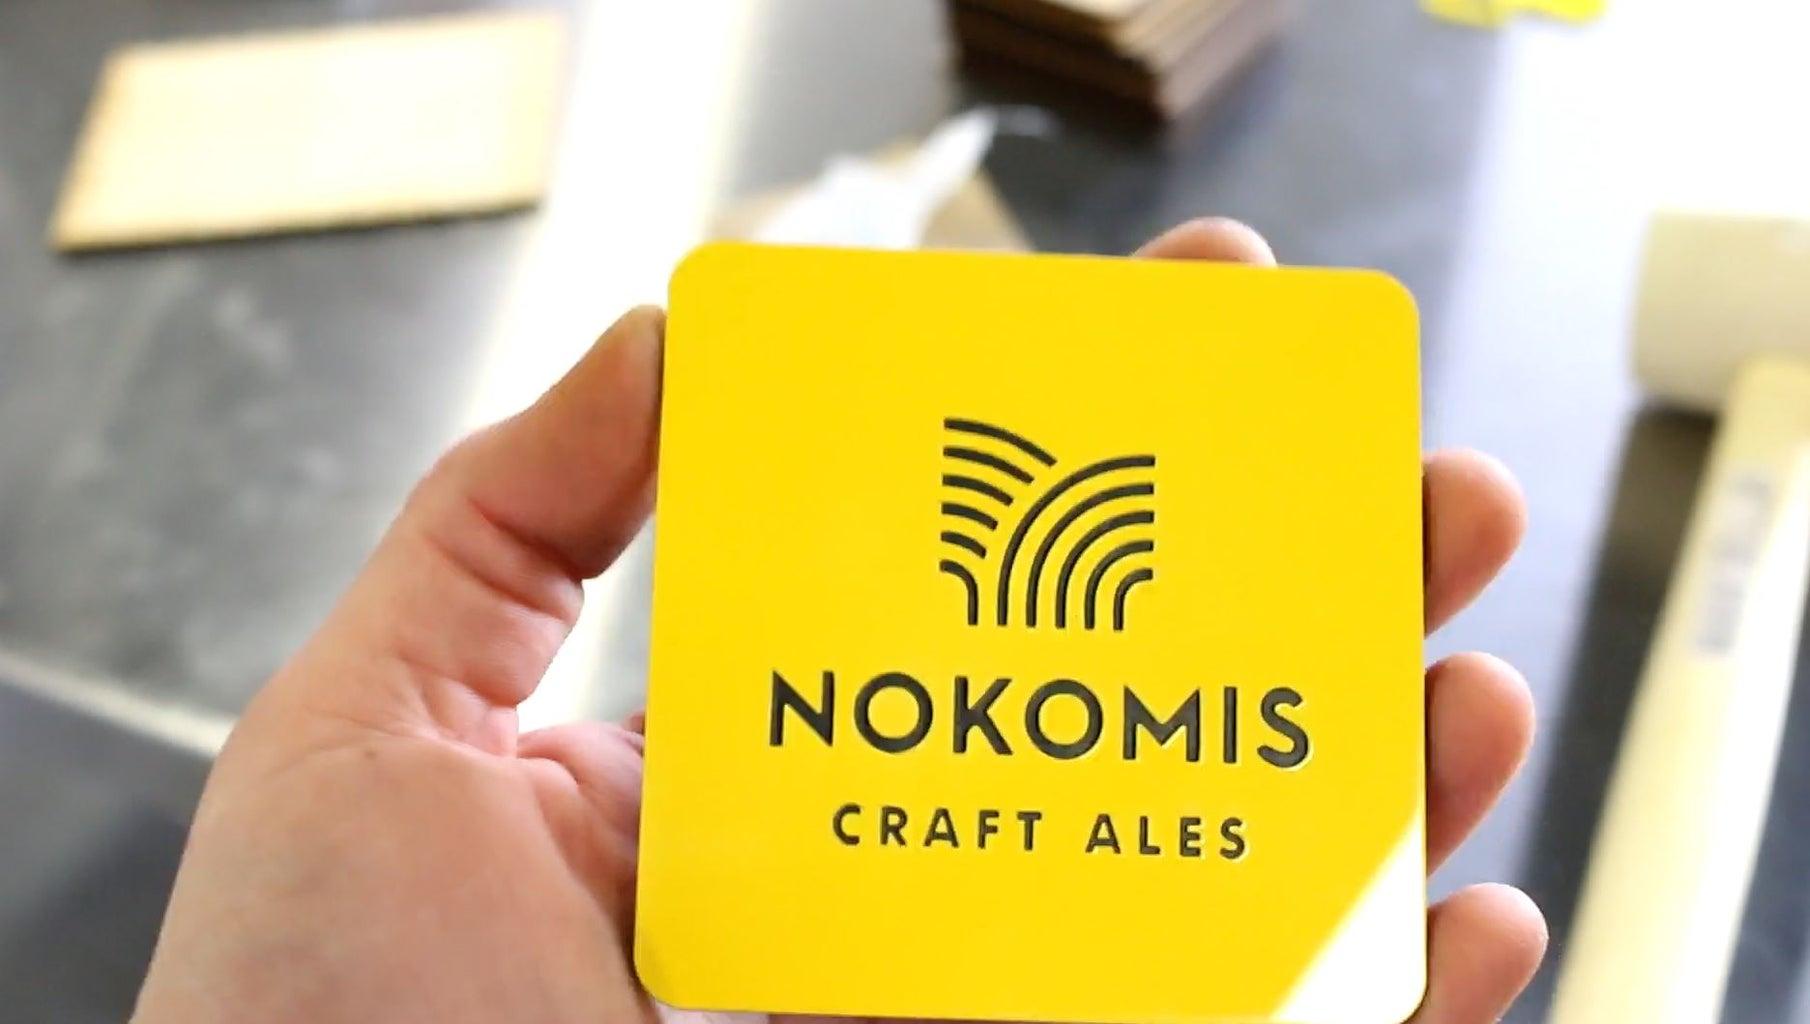 Coaster 6: Nokomis Craft Ales